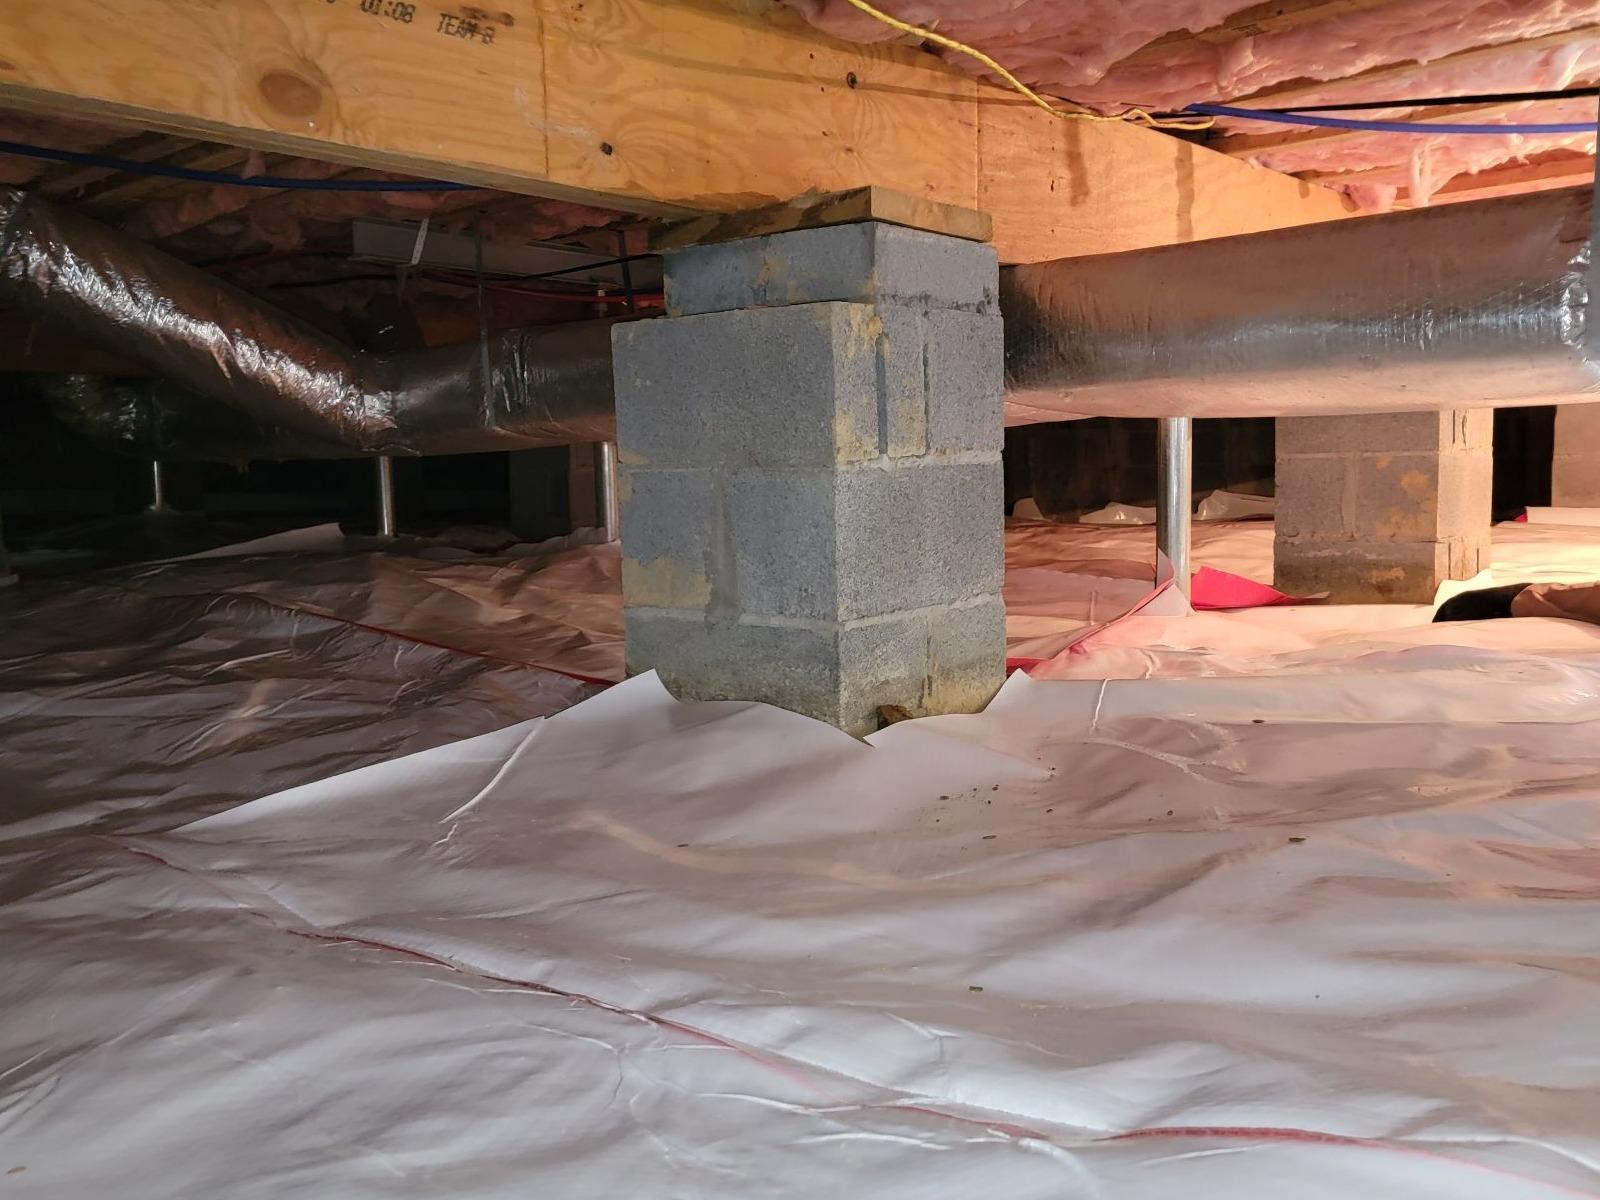 Repairing a Crawlspace Near Bandy, VA - After Photo